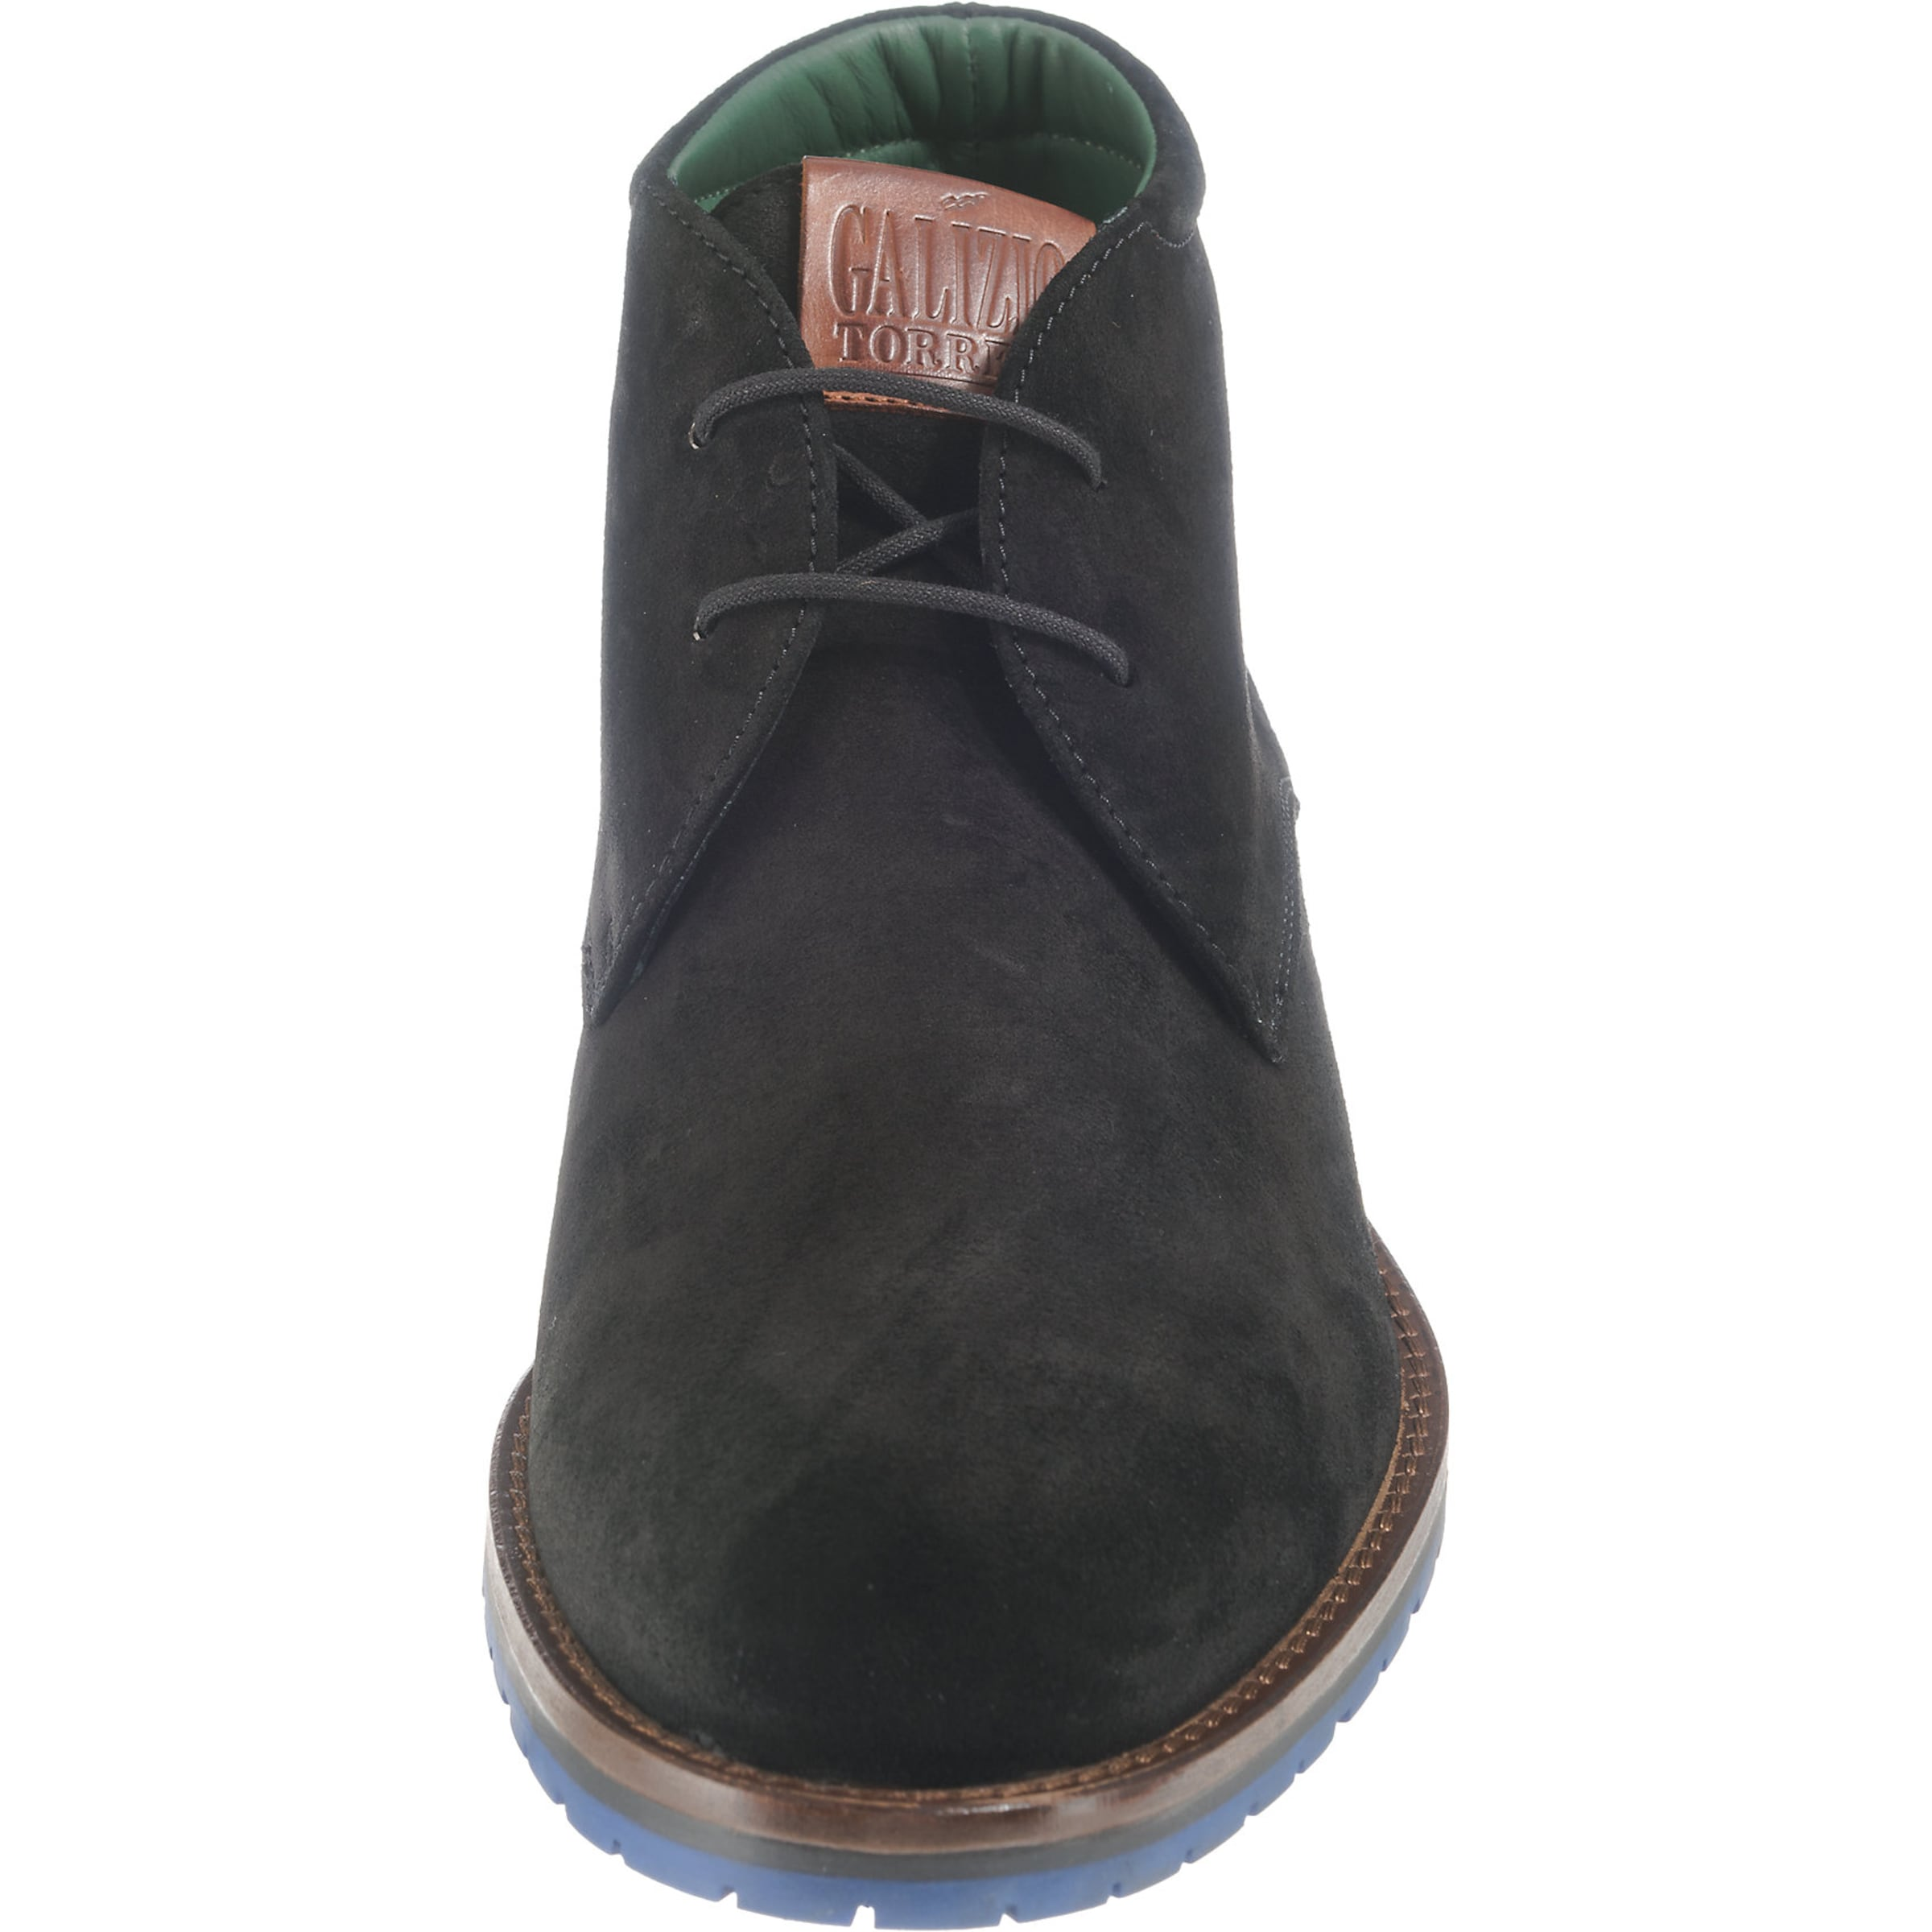 In Torresi Torresi Schwarz In Torresi Galizio Schwarz Boots Galizio Galizio Boots tQdxChrBs